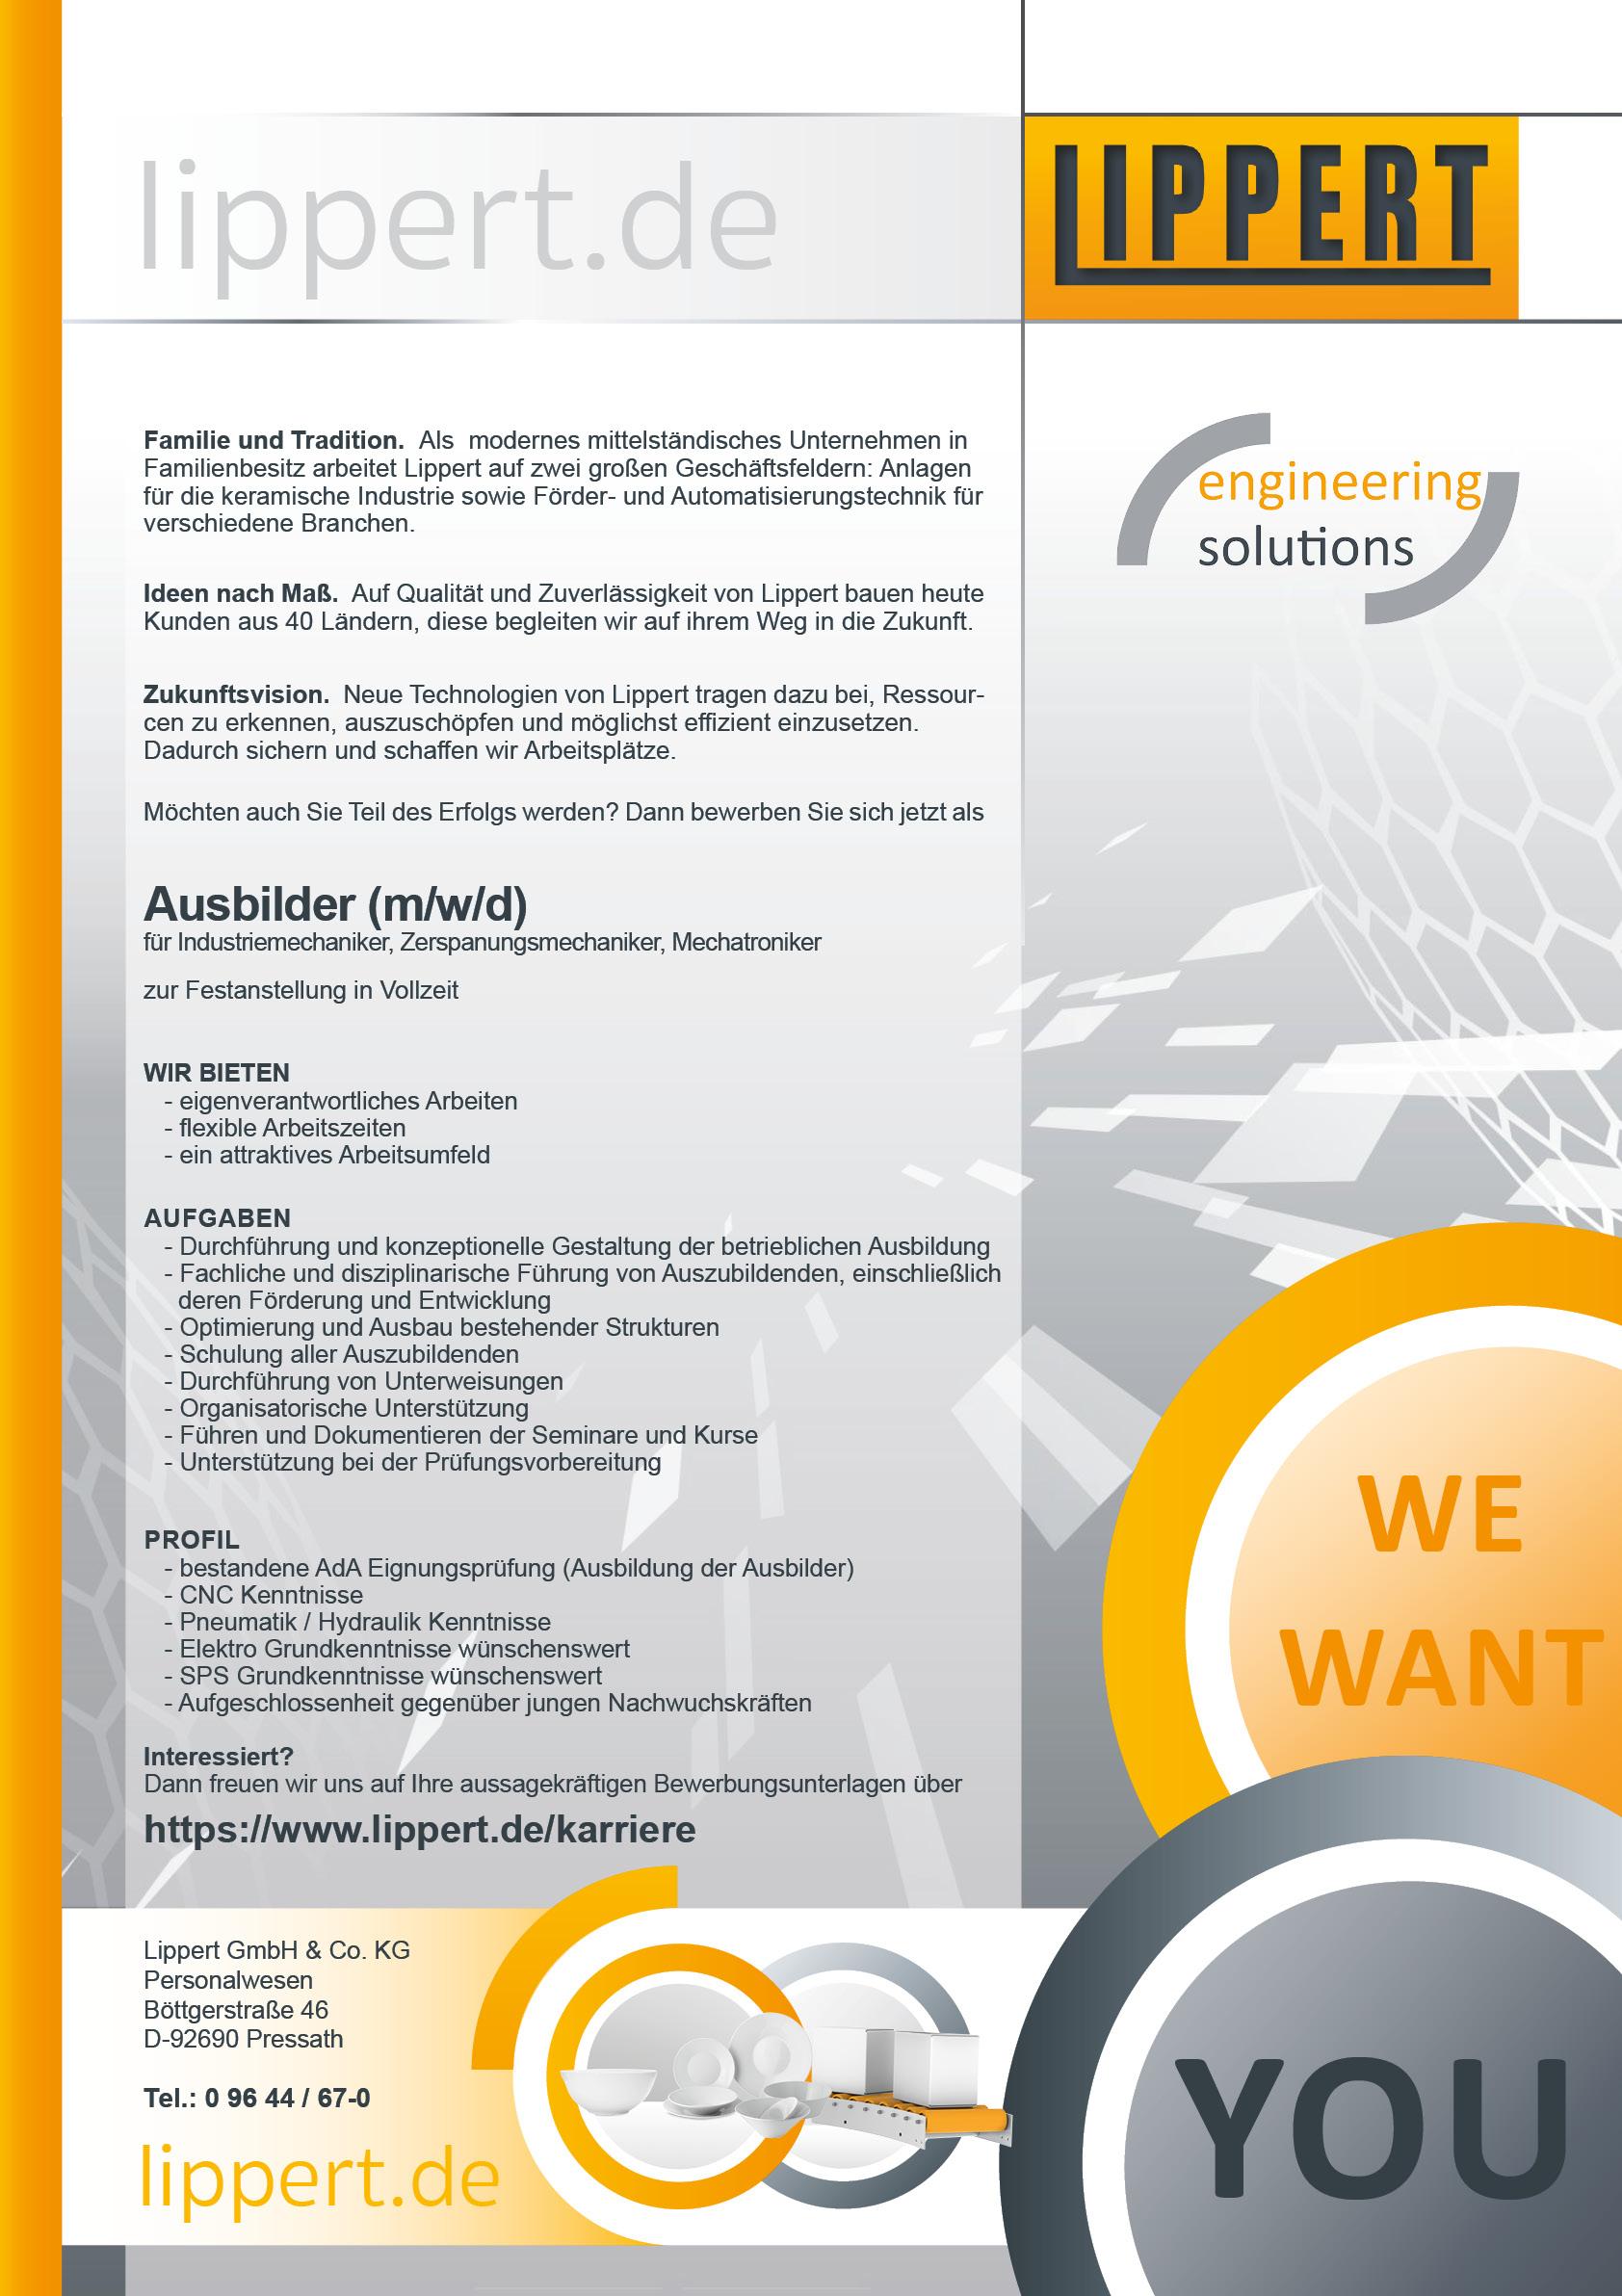 Ausbilder Industrie-, Zerspanungsmechaniker, Mechatroniker (m/w/d)